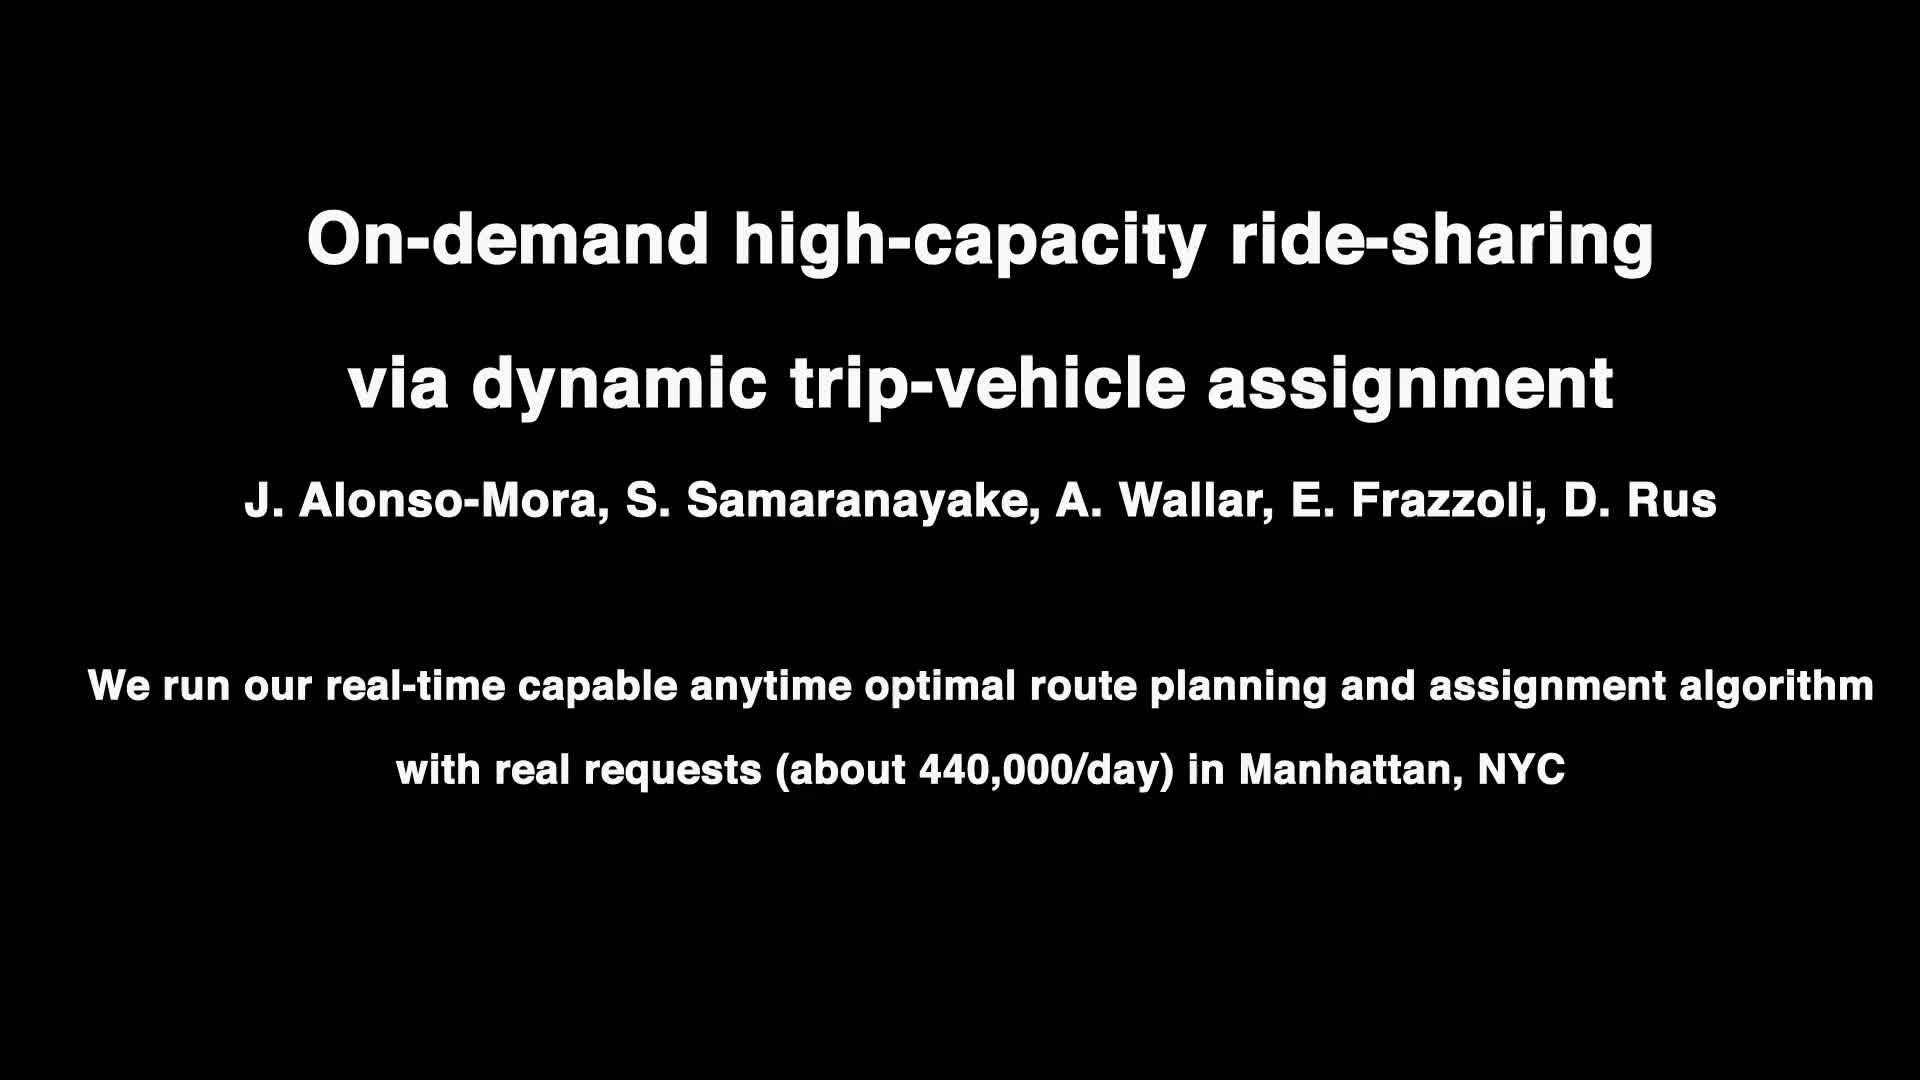 On-demand high-capacity ride-sharing via dynamic trip